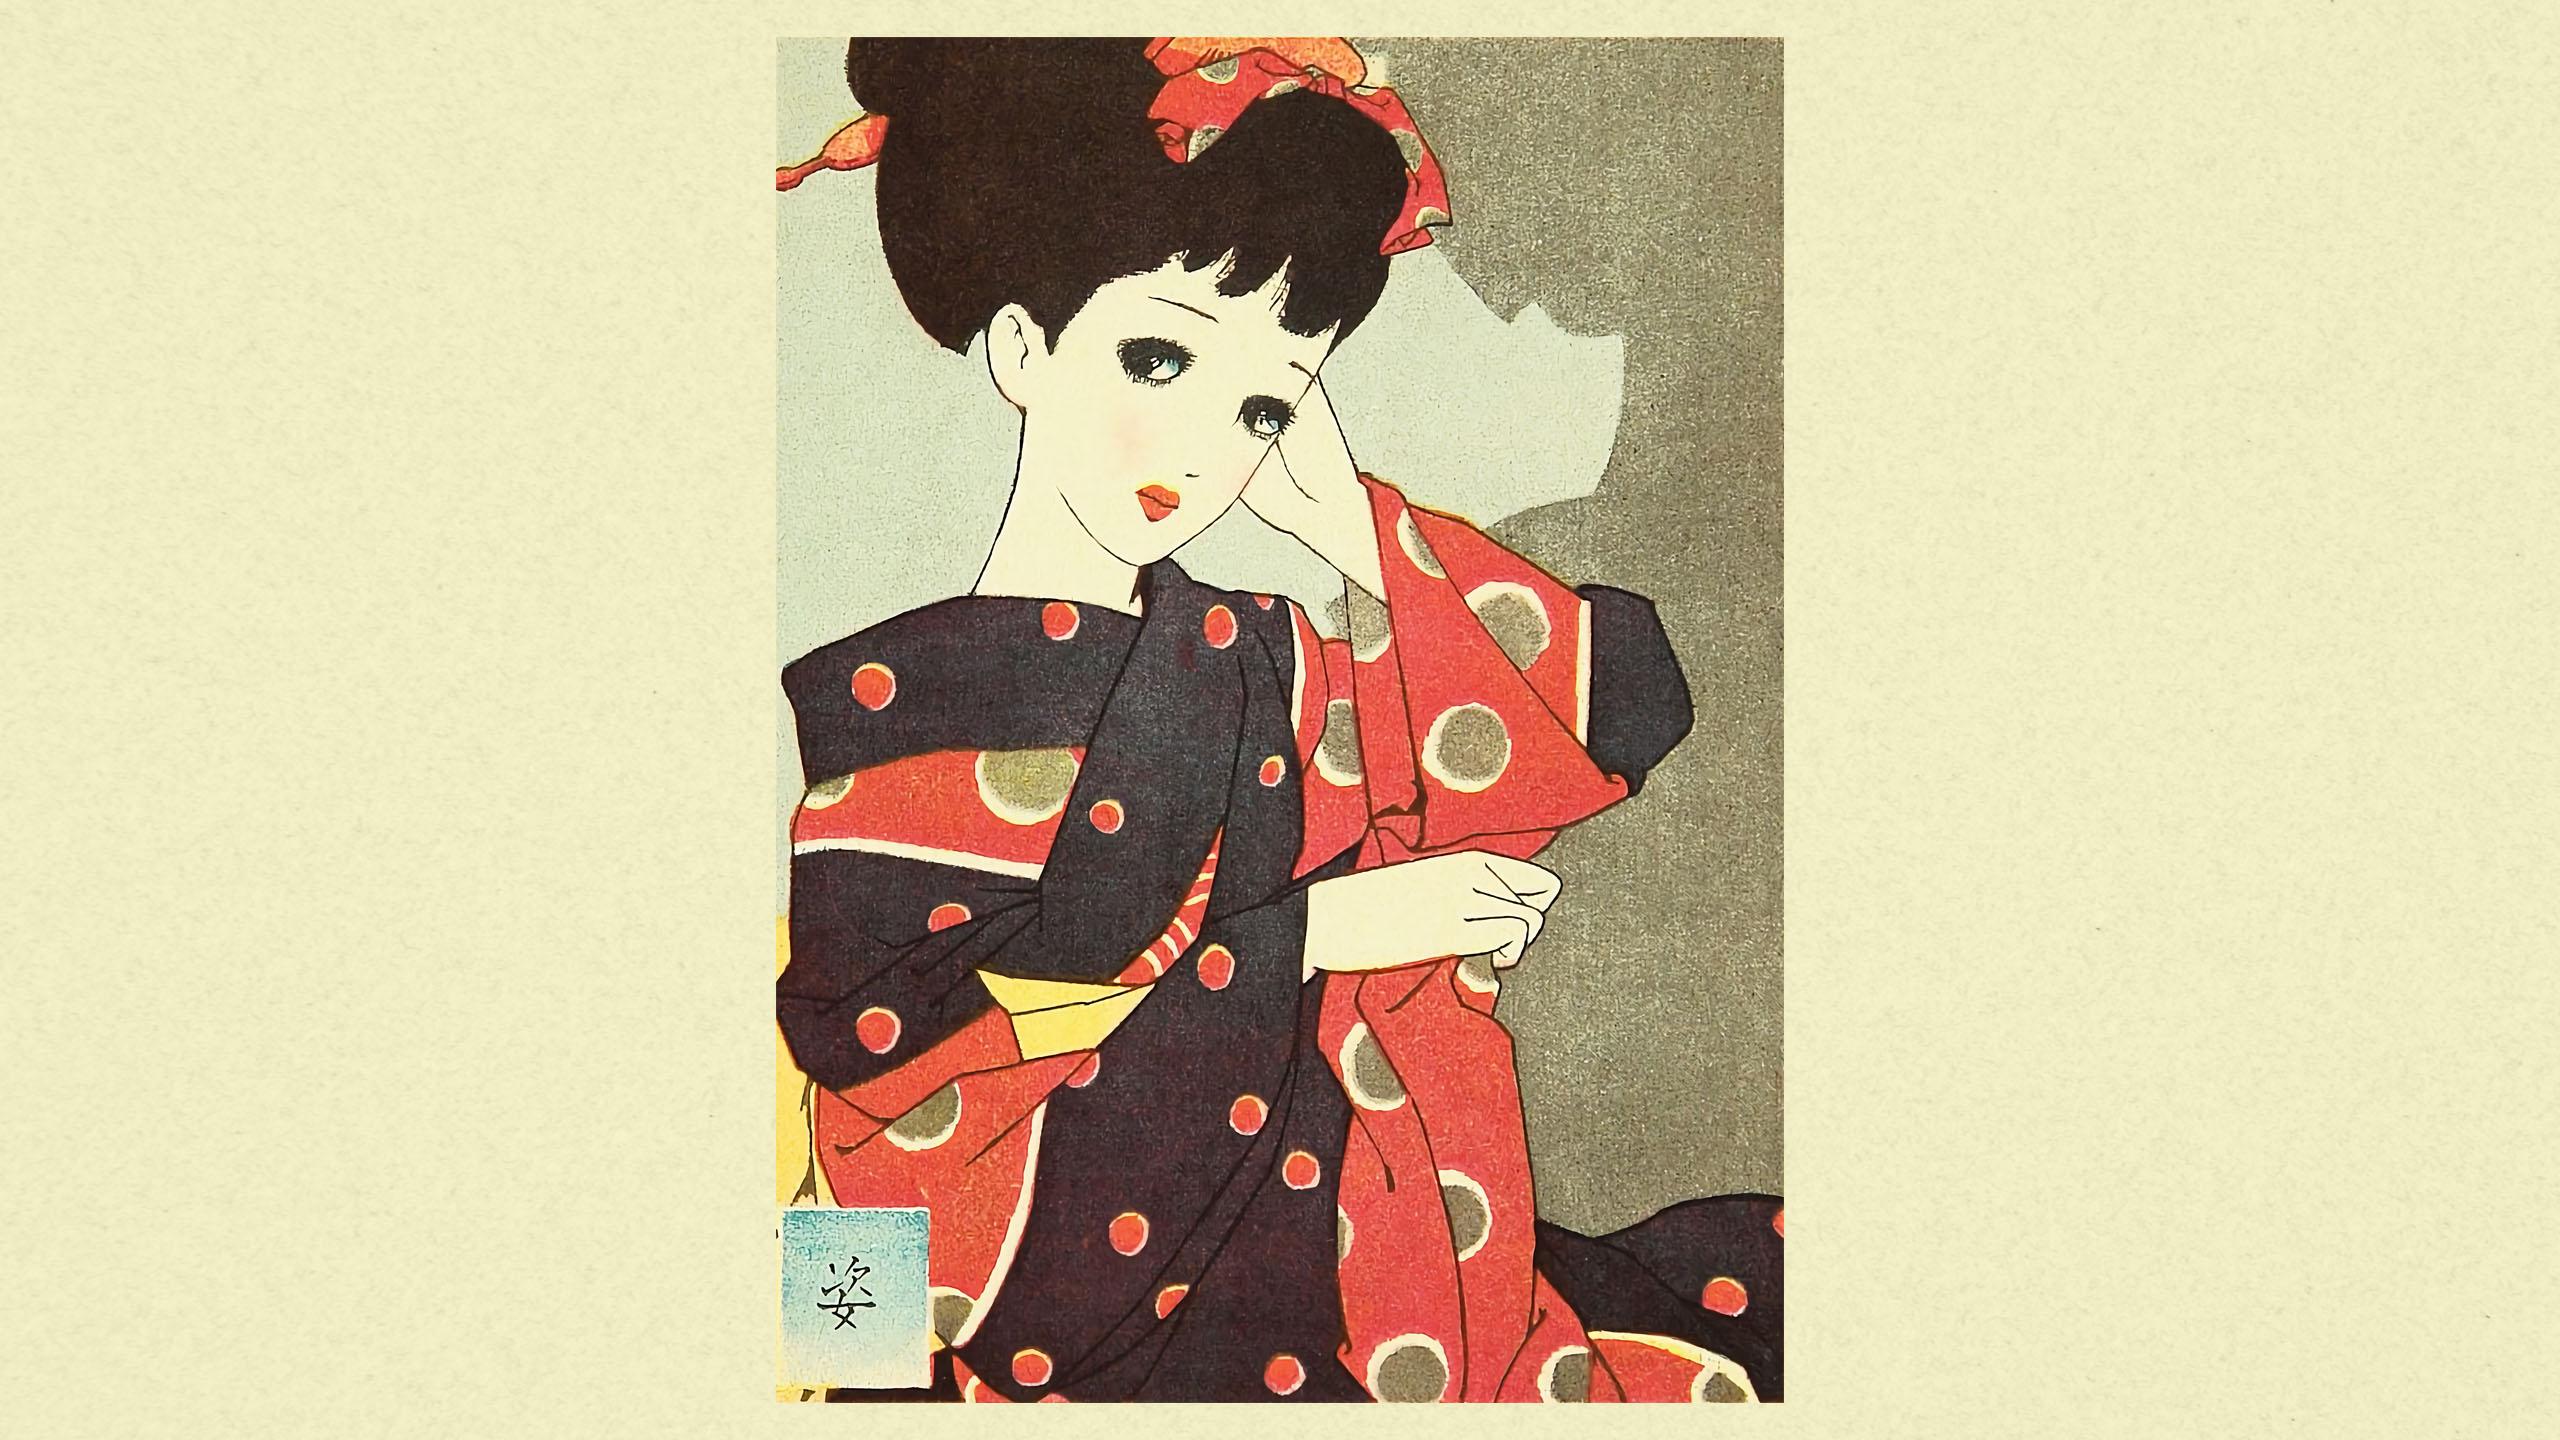 Nakahara Junichi - Sugata 2560x1440